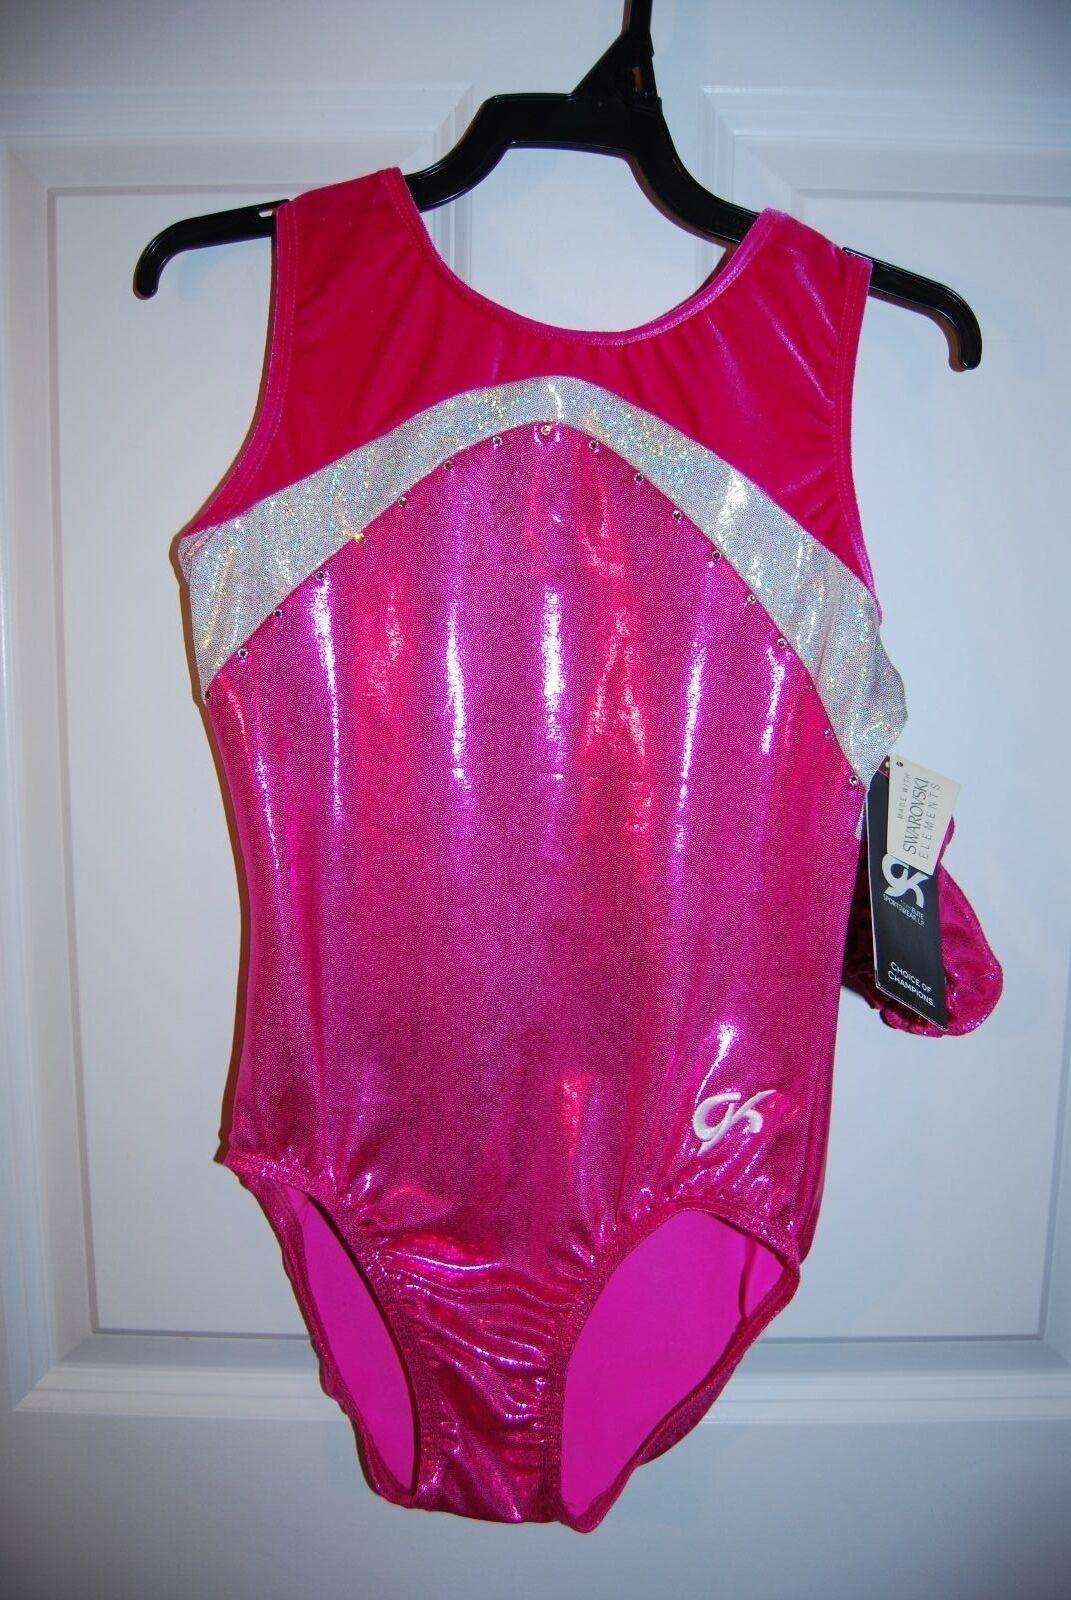 GK  Elite Gymnastics Leotard - Adult Small - Berry White Sparkle  here has the latest